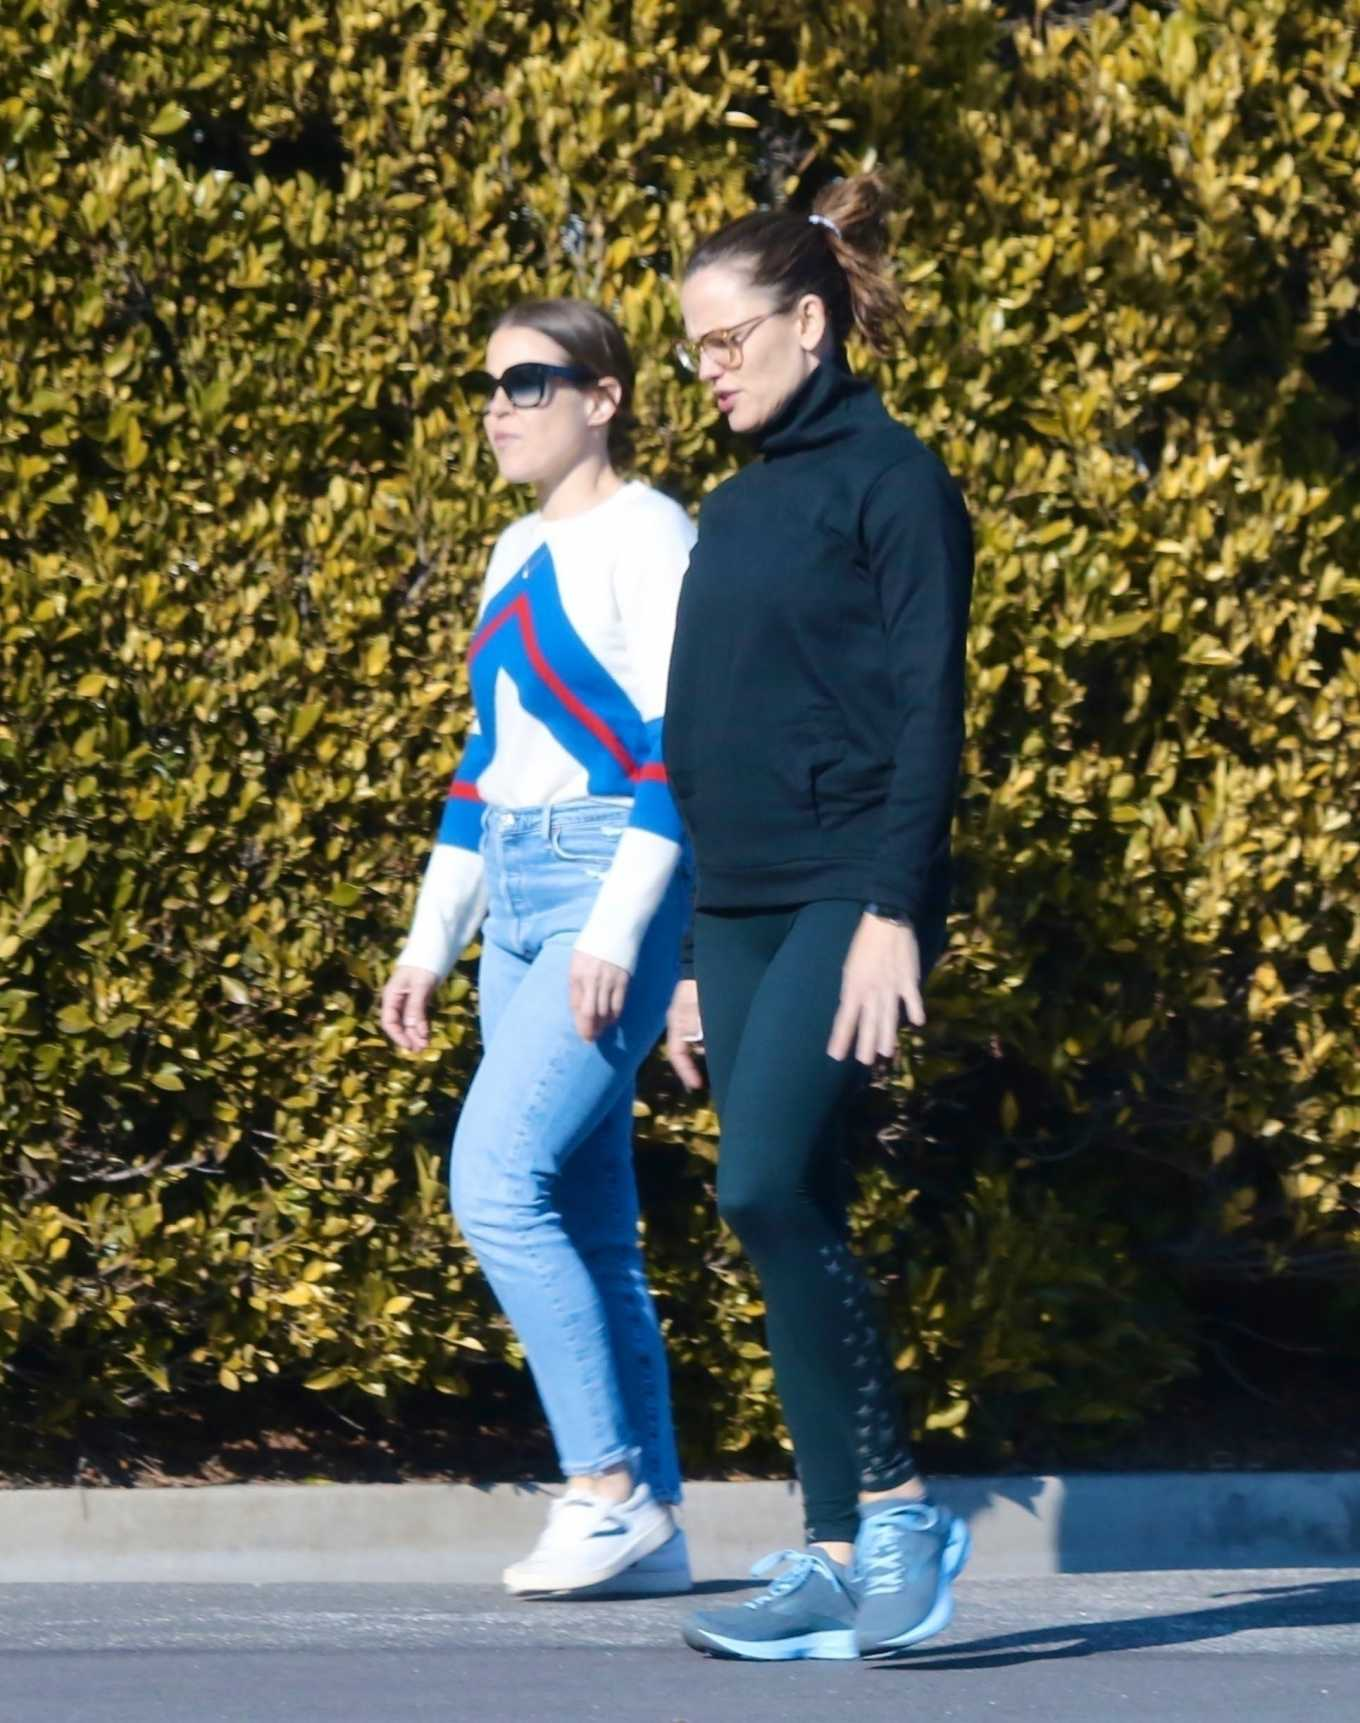 Jennifer Garner 2020 : Jennifer Garner with a friend out for a power walk session in Pacific Palisades-13